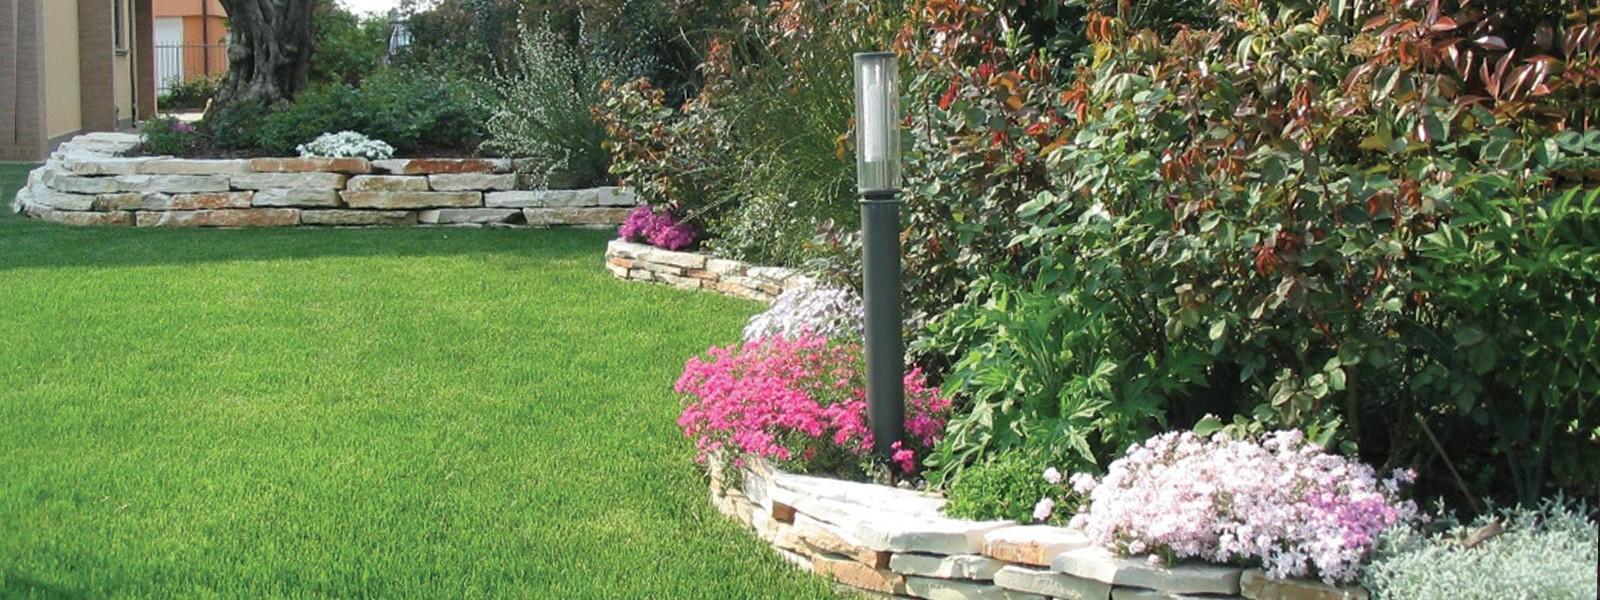 Fabulous giardini ed aree verdi with progetto giardini for Laghetto balneabile progetto